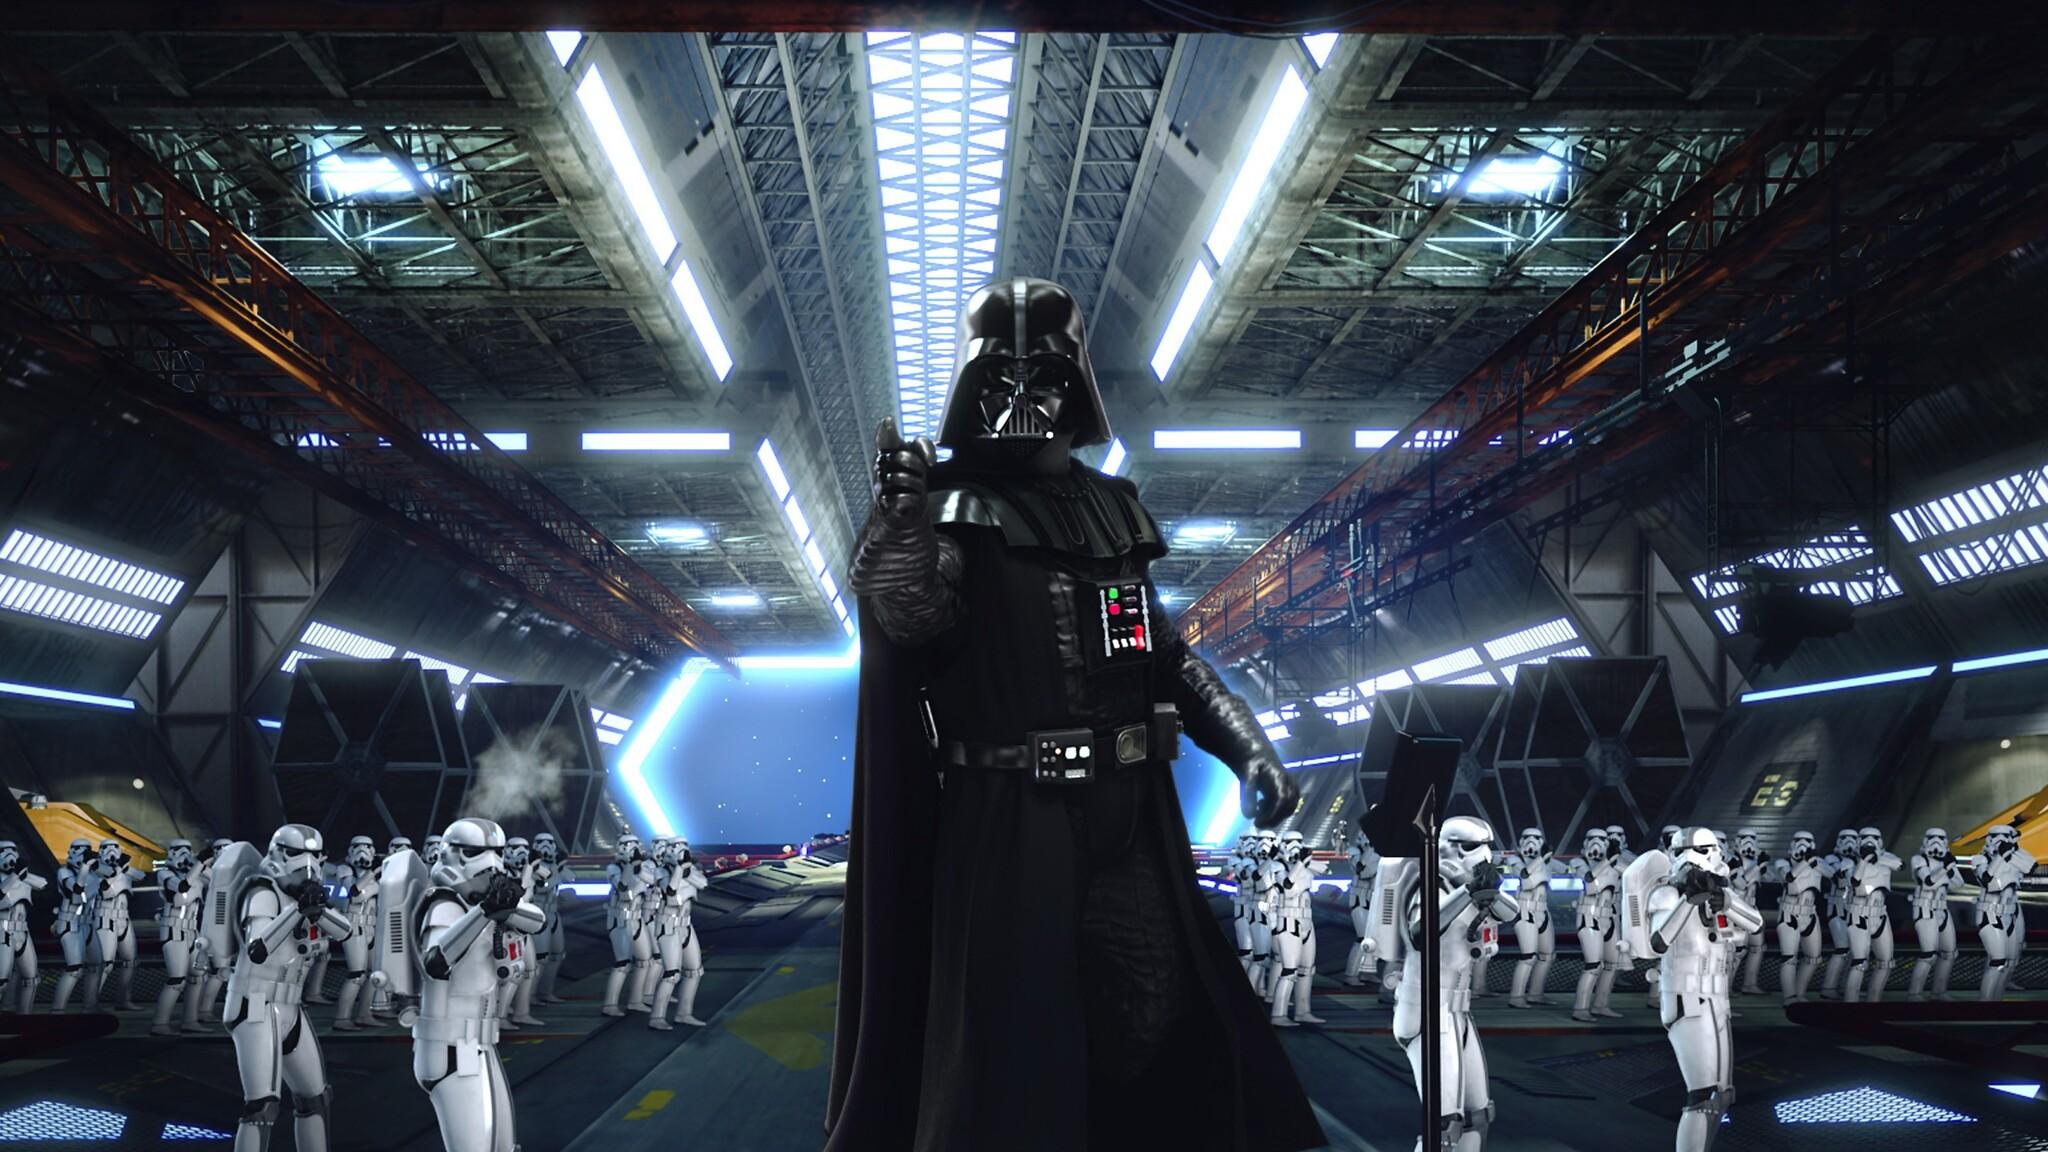 2016-darth-vader-stormtroopers.jpg